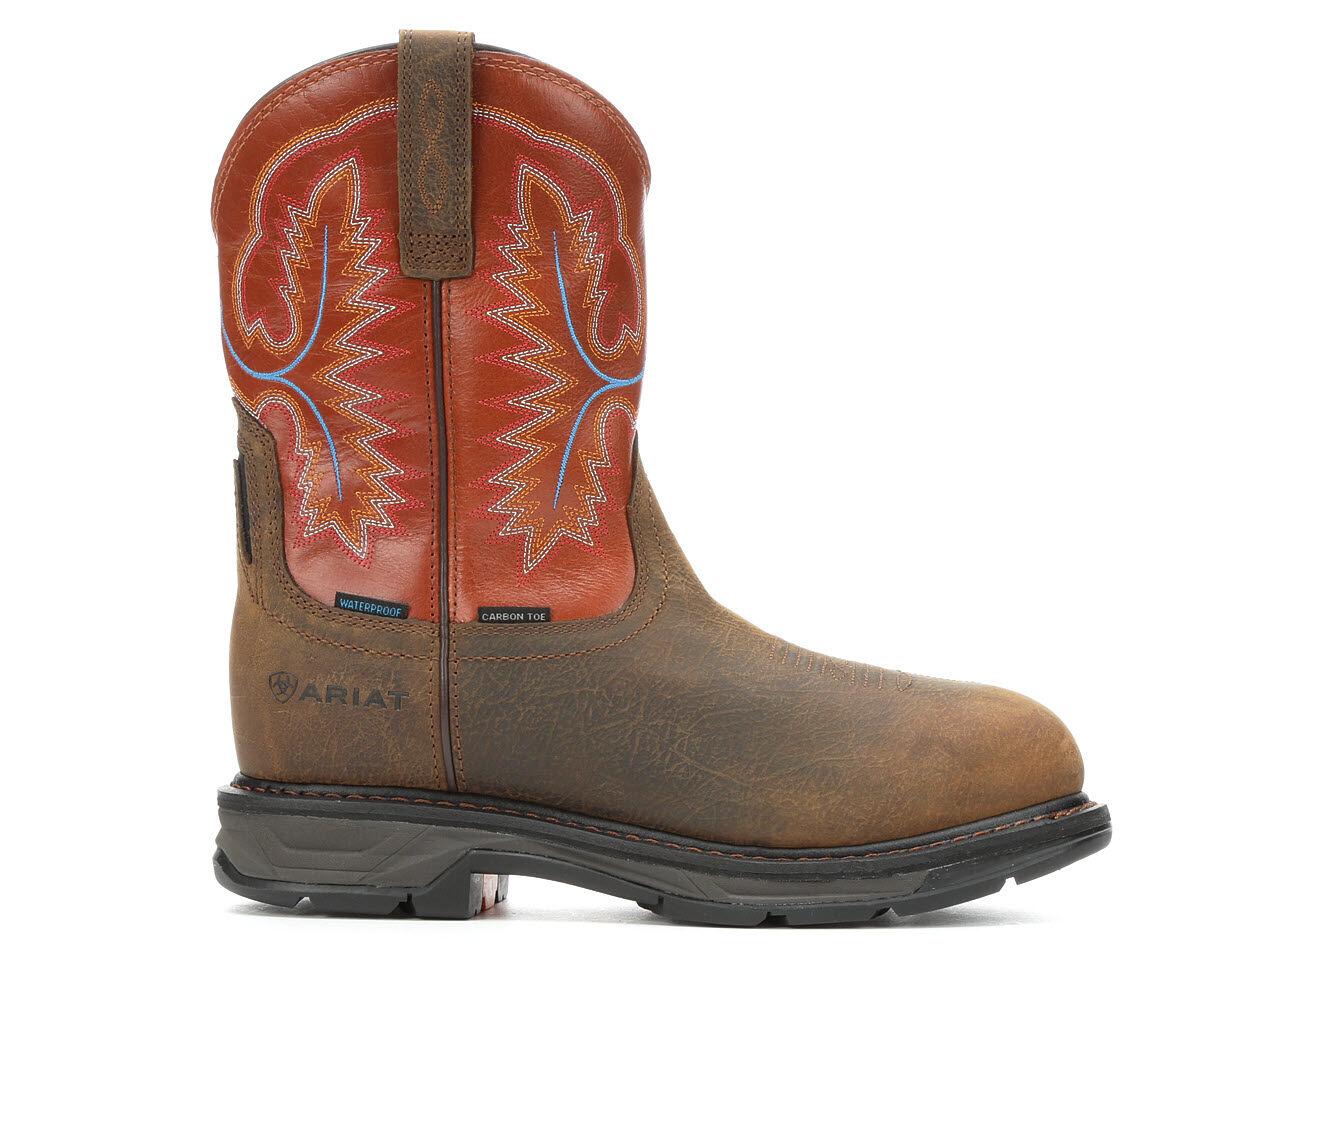 Men's Ariat Workhog XT Carbon Toe Cowboy Boots Rye Brown/Buck